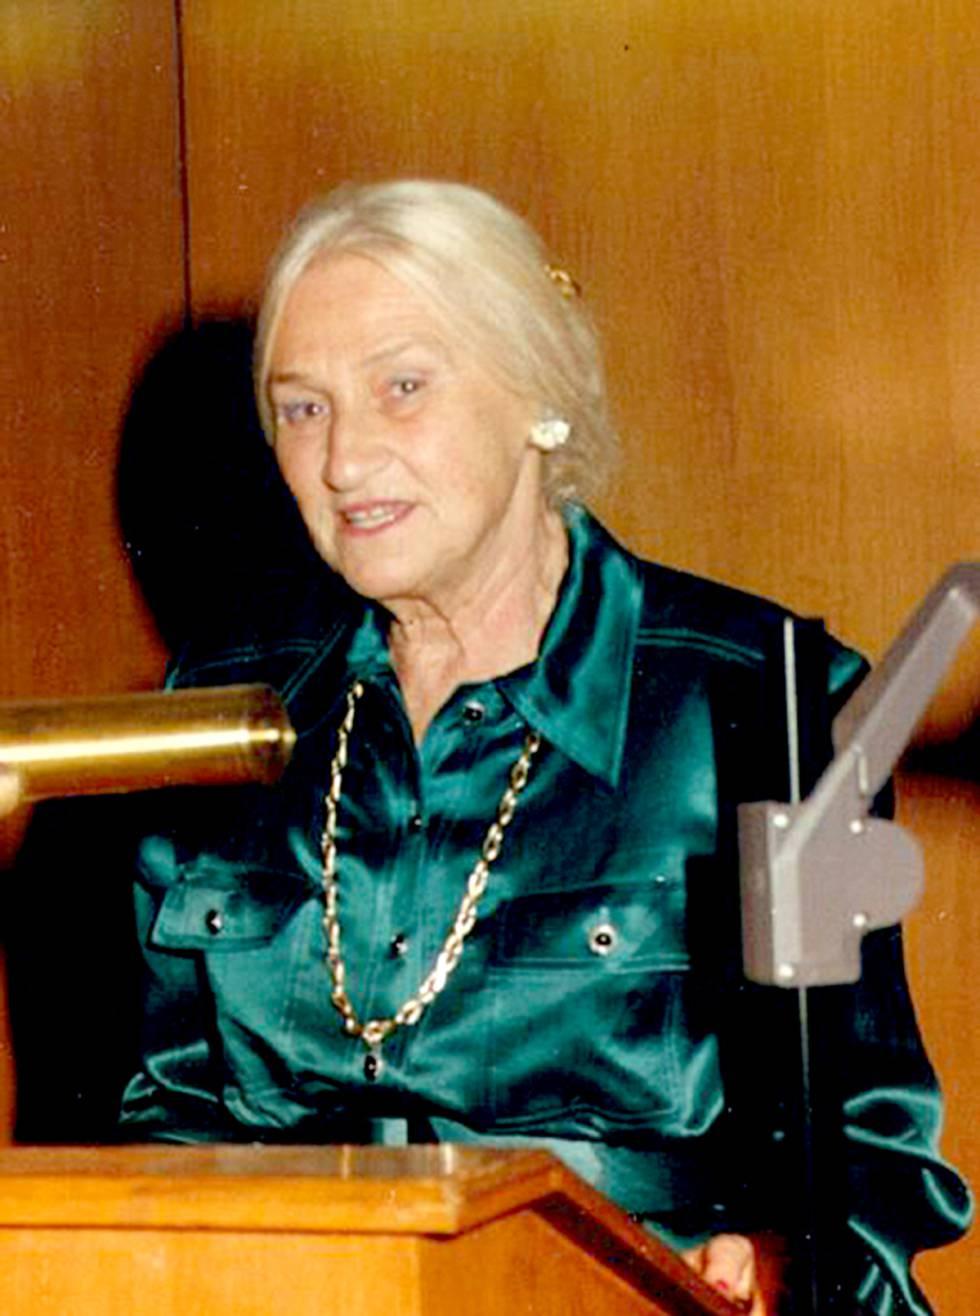 Marianne Grunberg-Manago, en una imagen de archivo.